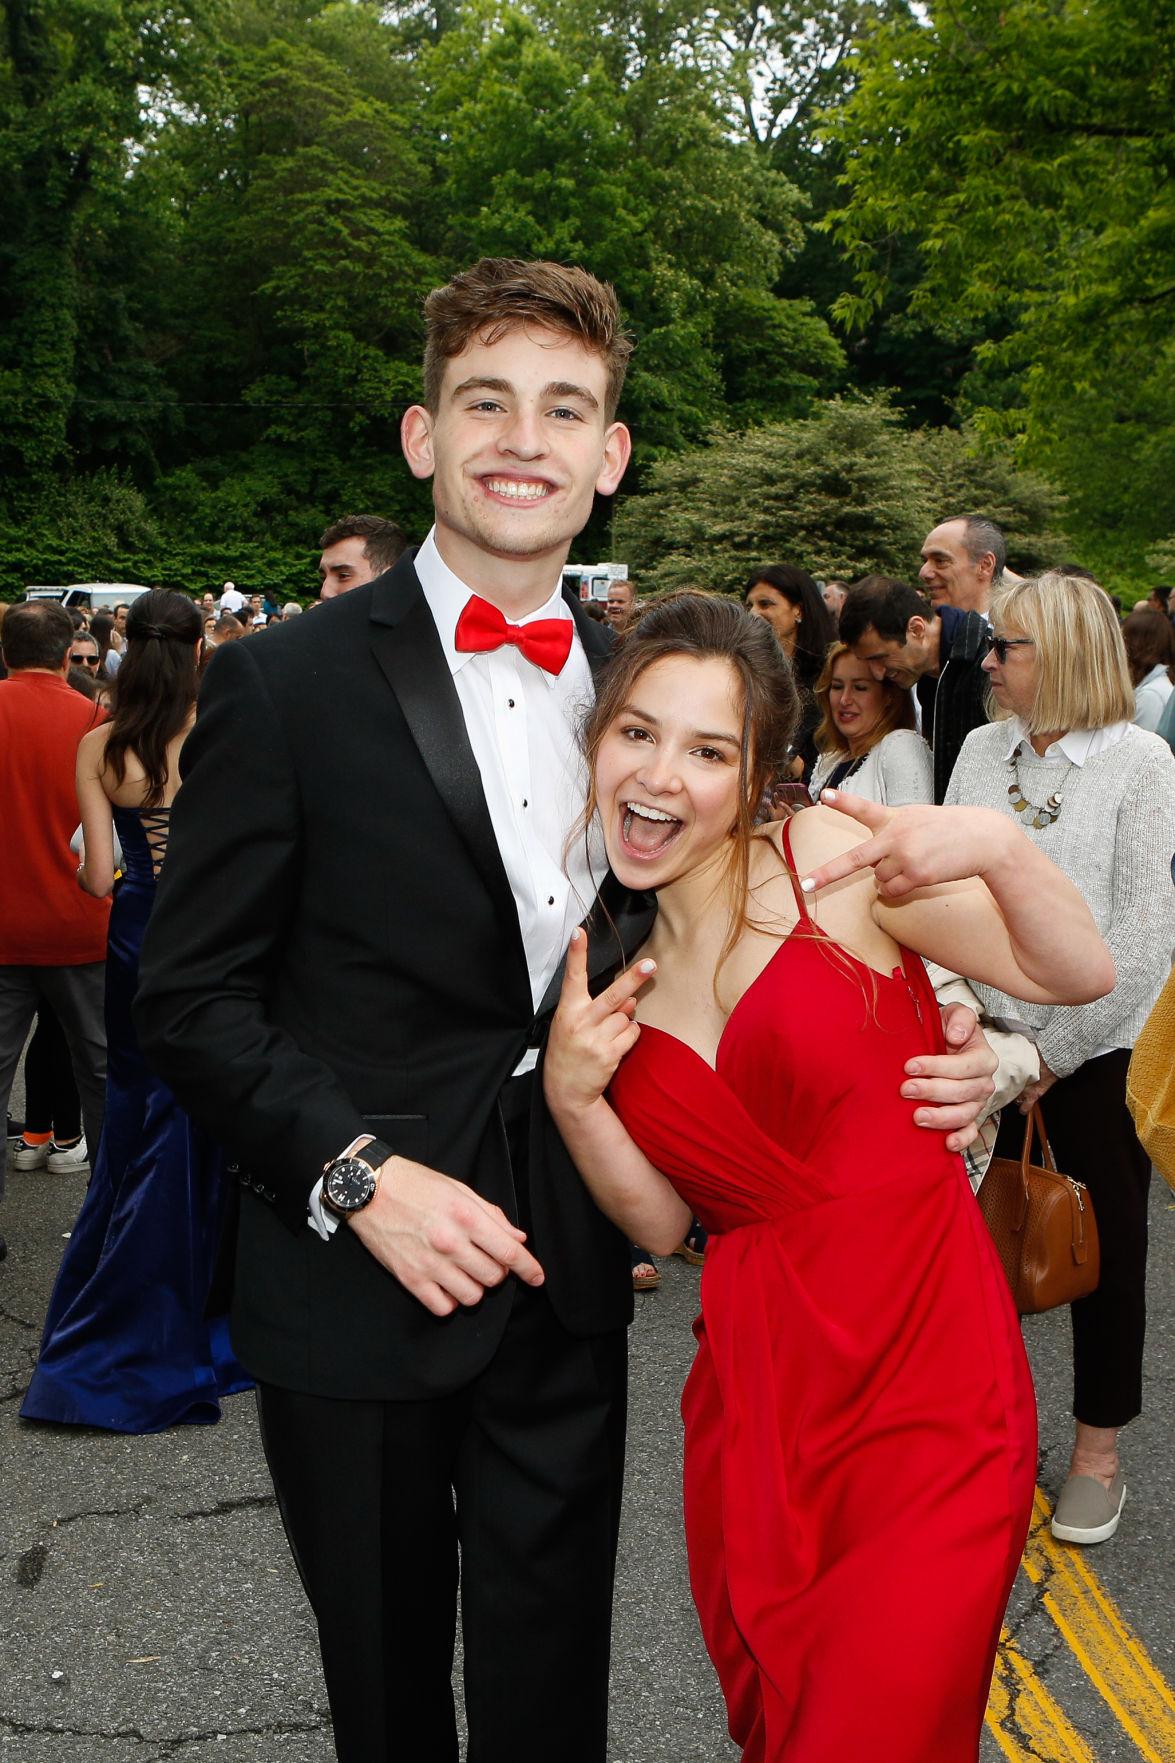 2 Scarsdale senior prom.jpg